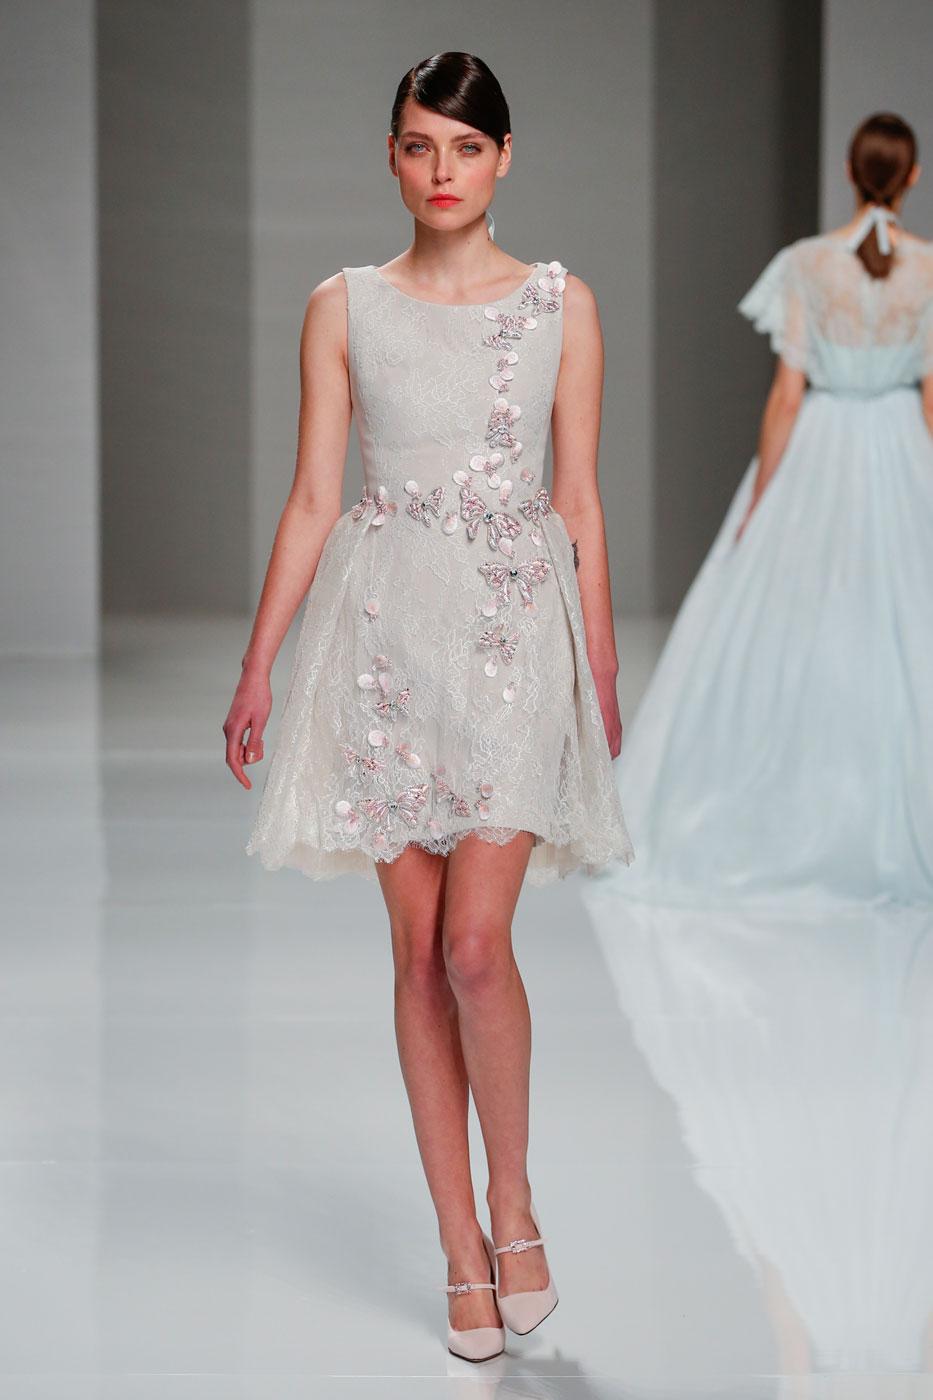 Georges-Hobeika-fashion-runway-show-haute-couture-paris-spring-2015-the-impression-63